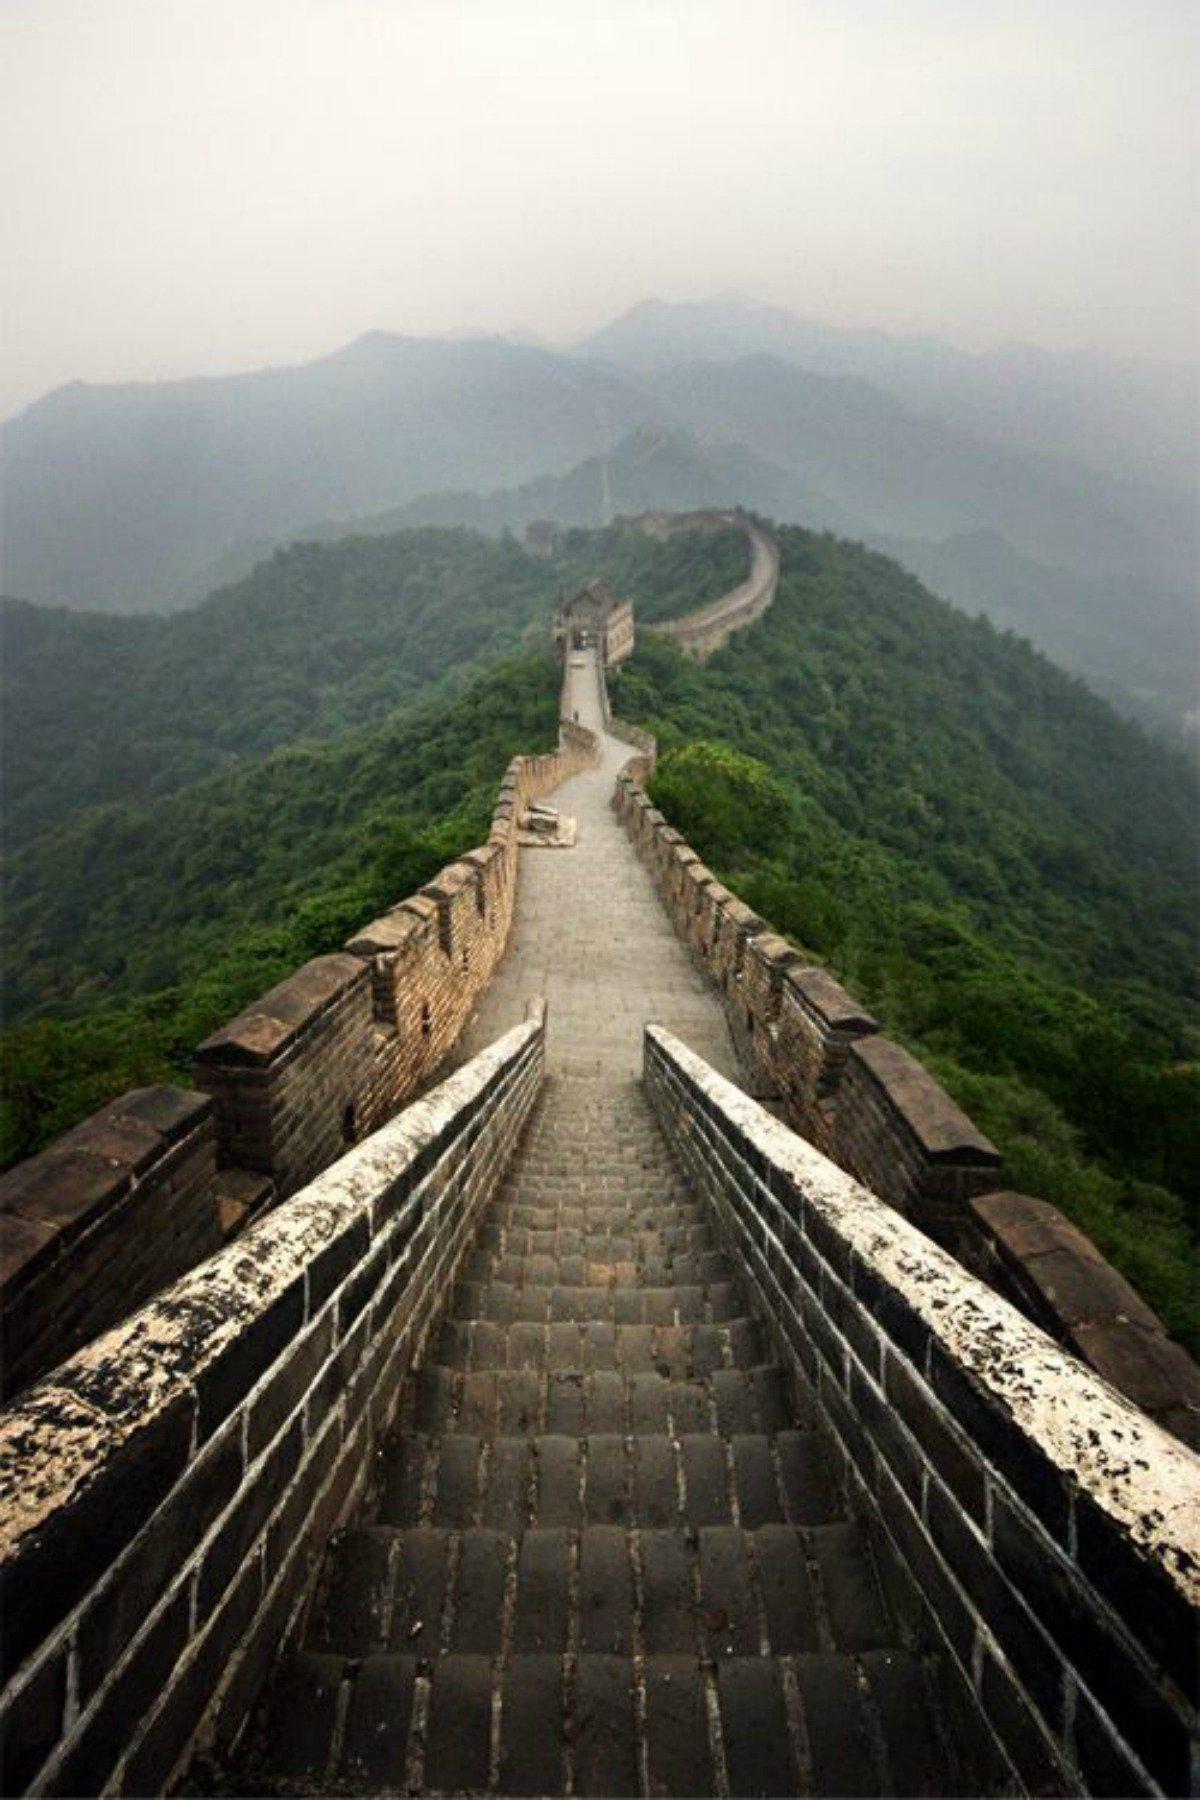 surprisinglives.net/great-wall-china-photo/